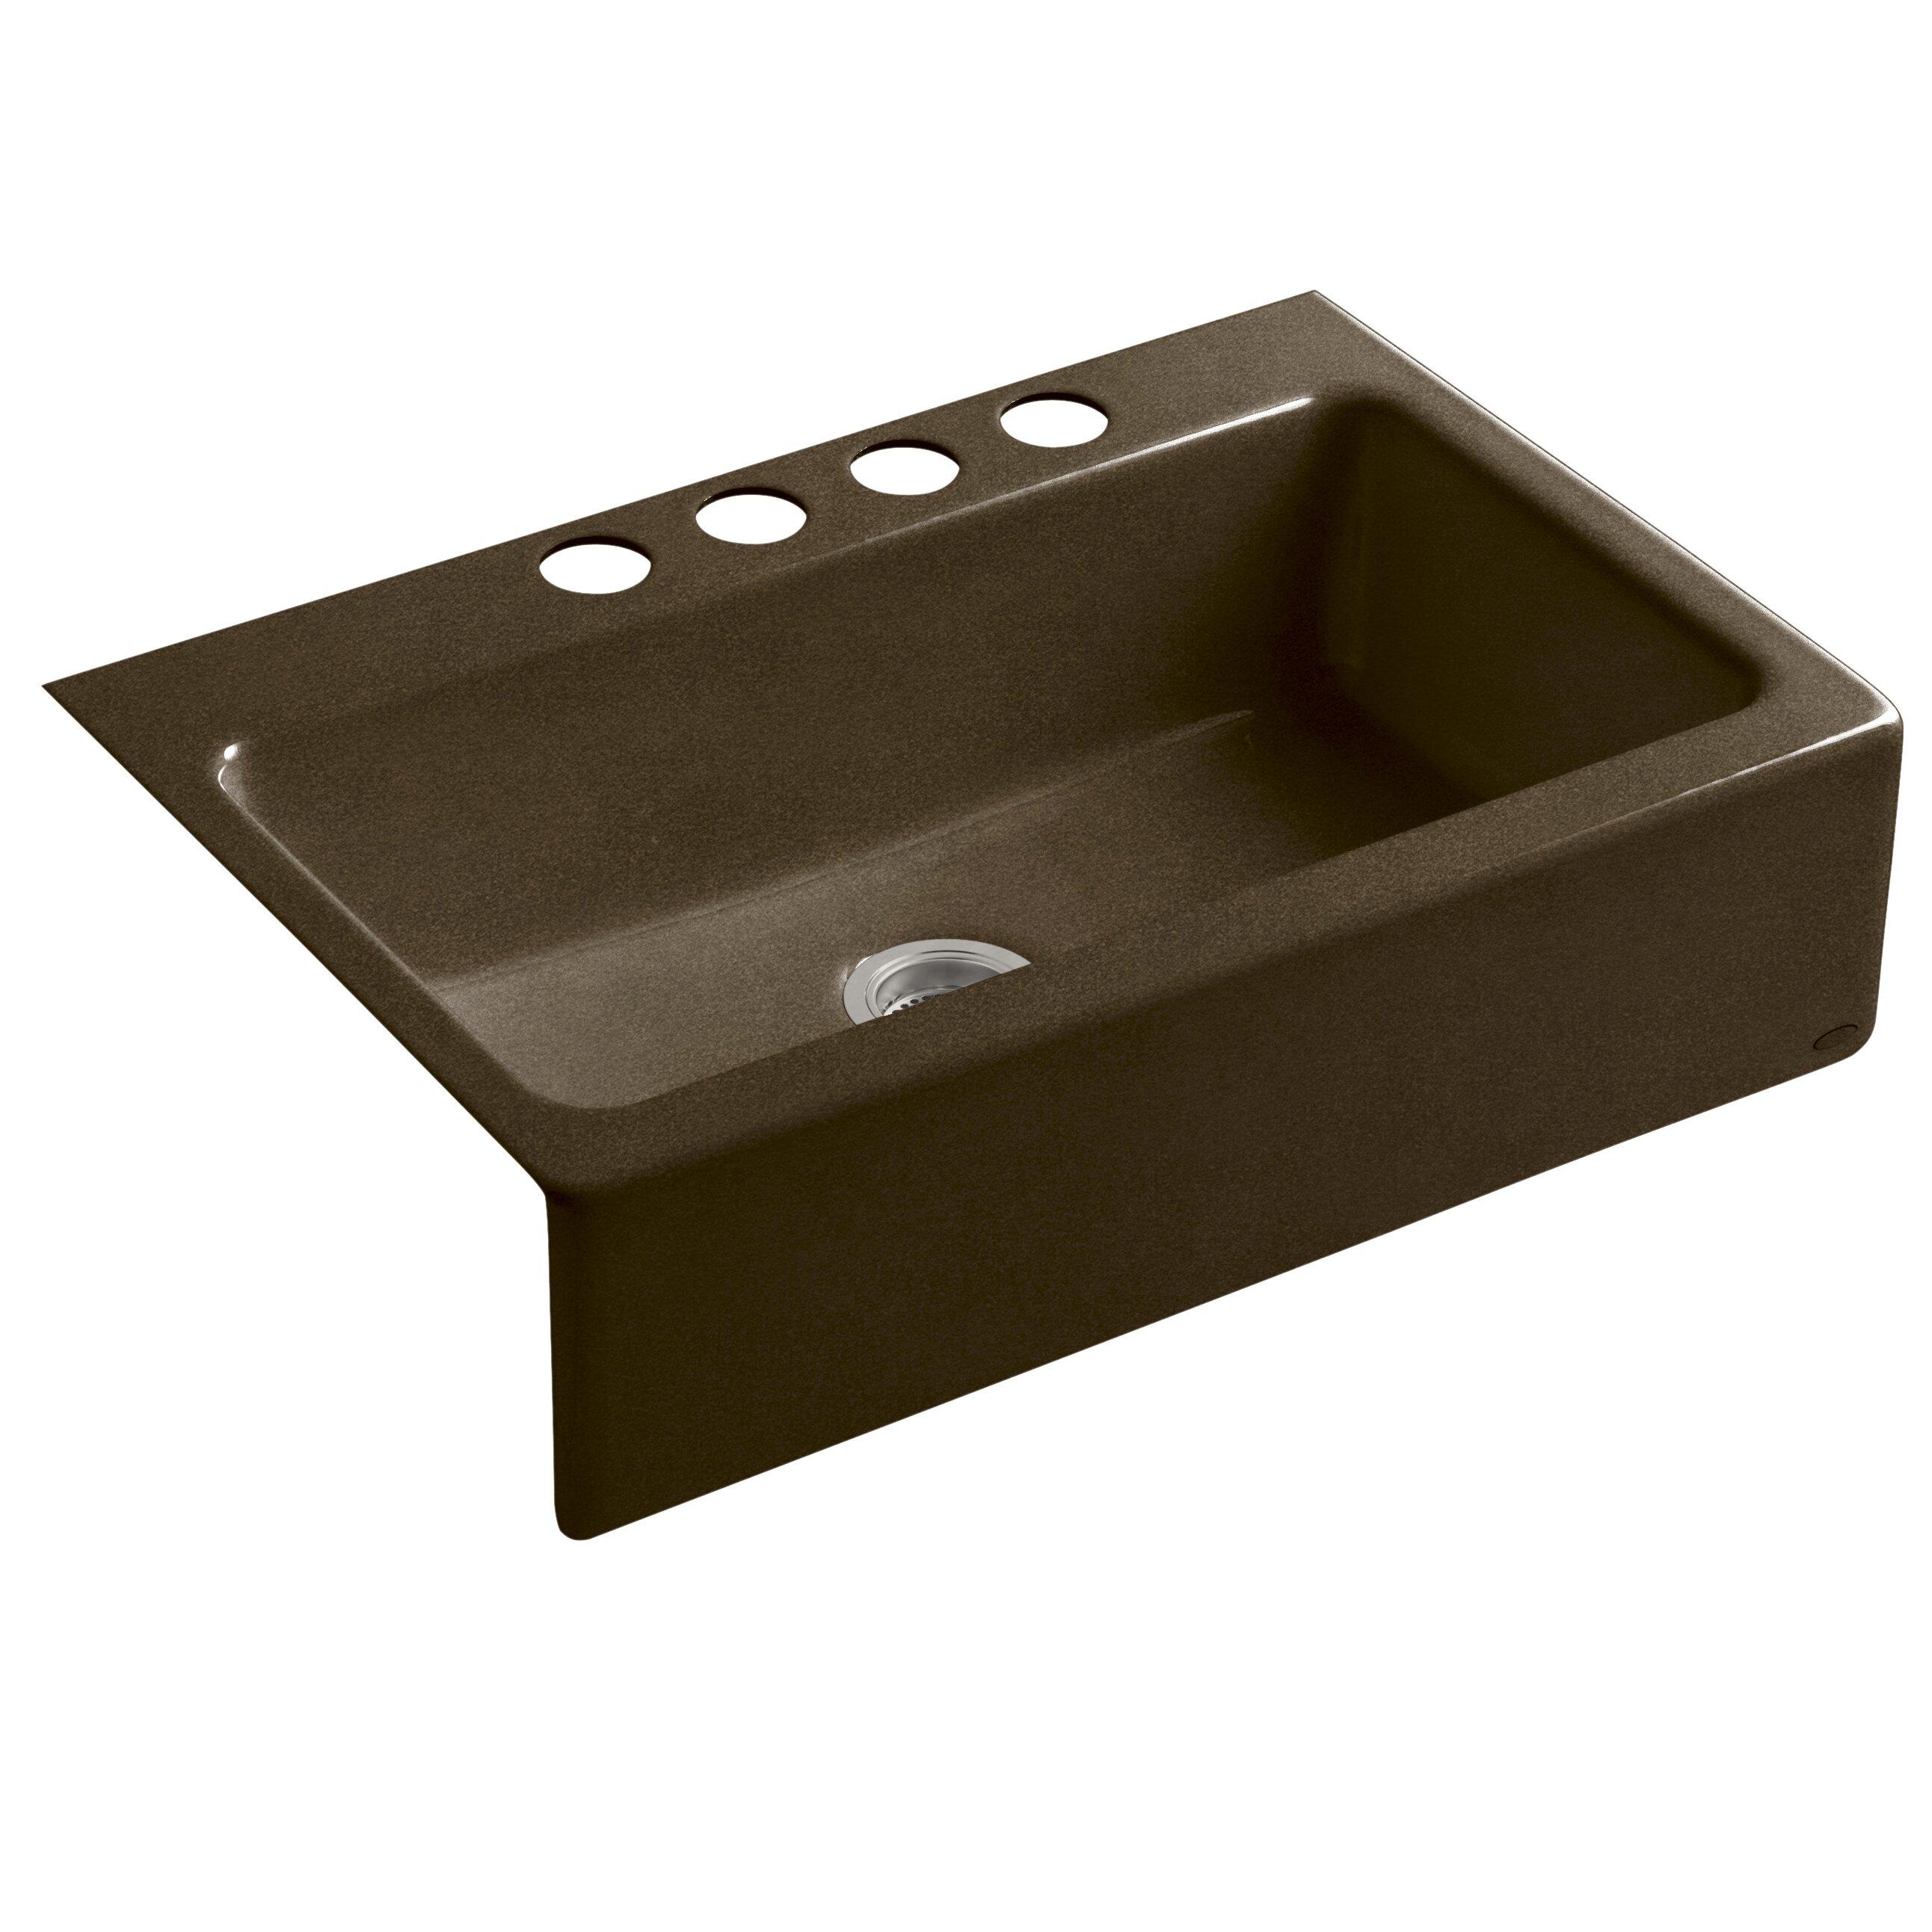 Kohler dickinson 33 x 22 1 8 x 8 3 4 apron front under mount single bowl kitchen sink with 4 - Kohler dickinson apron front sink ...